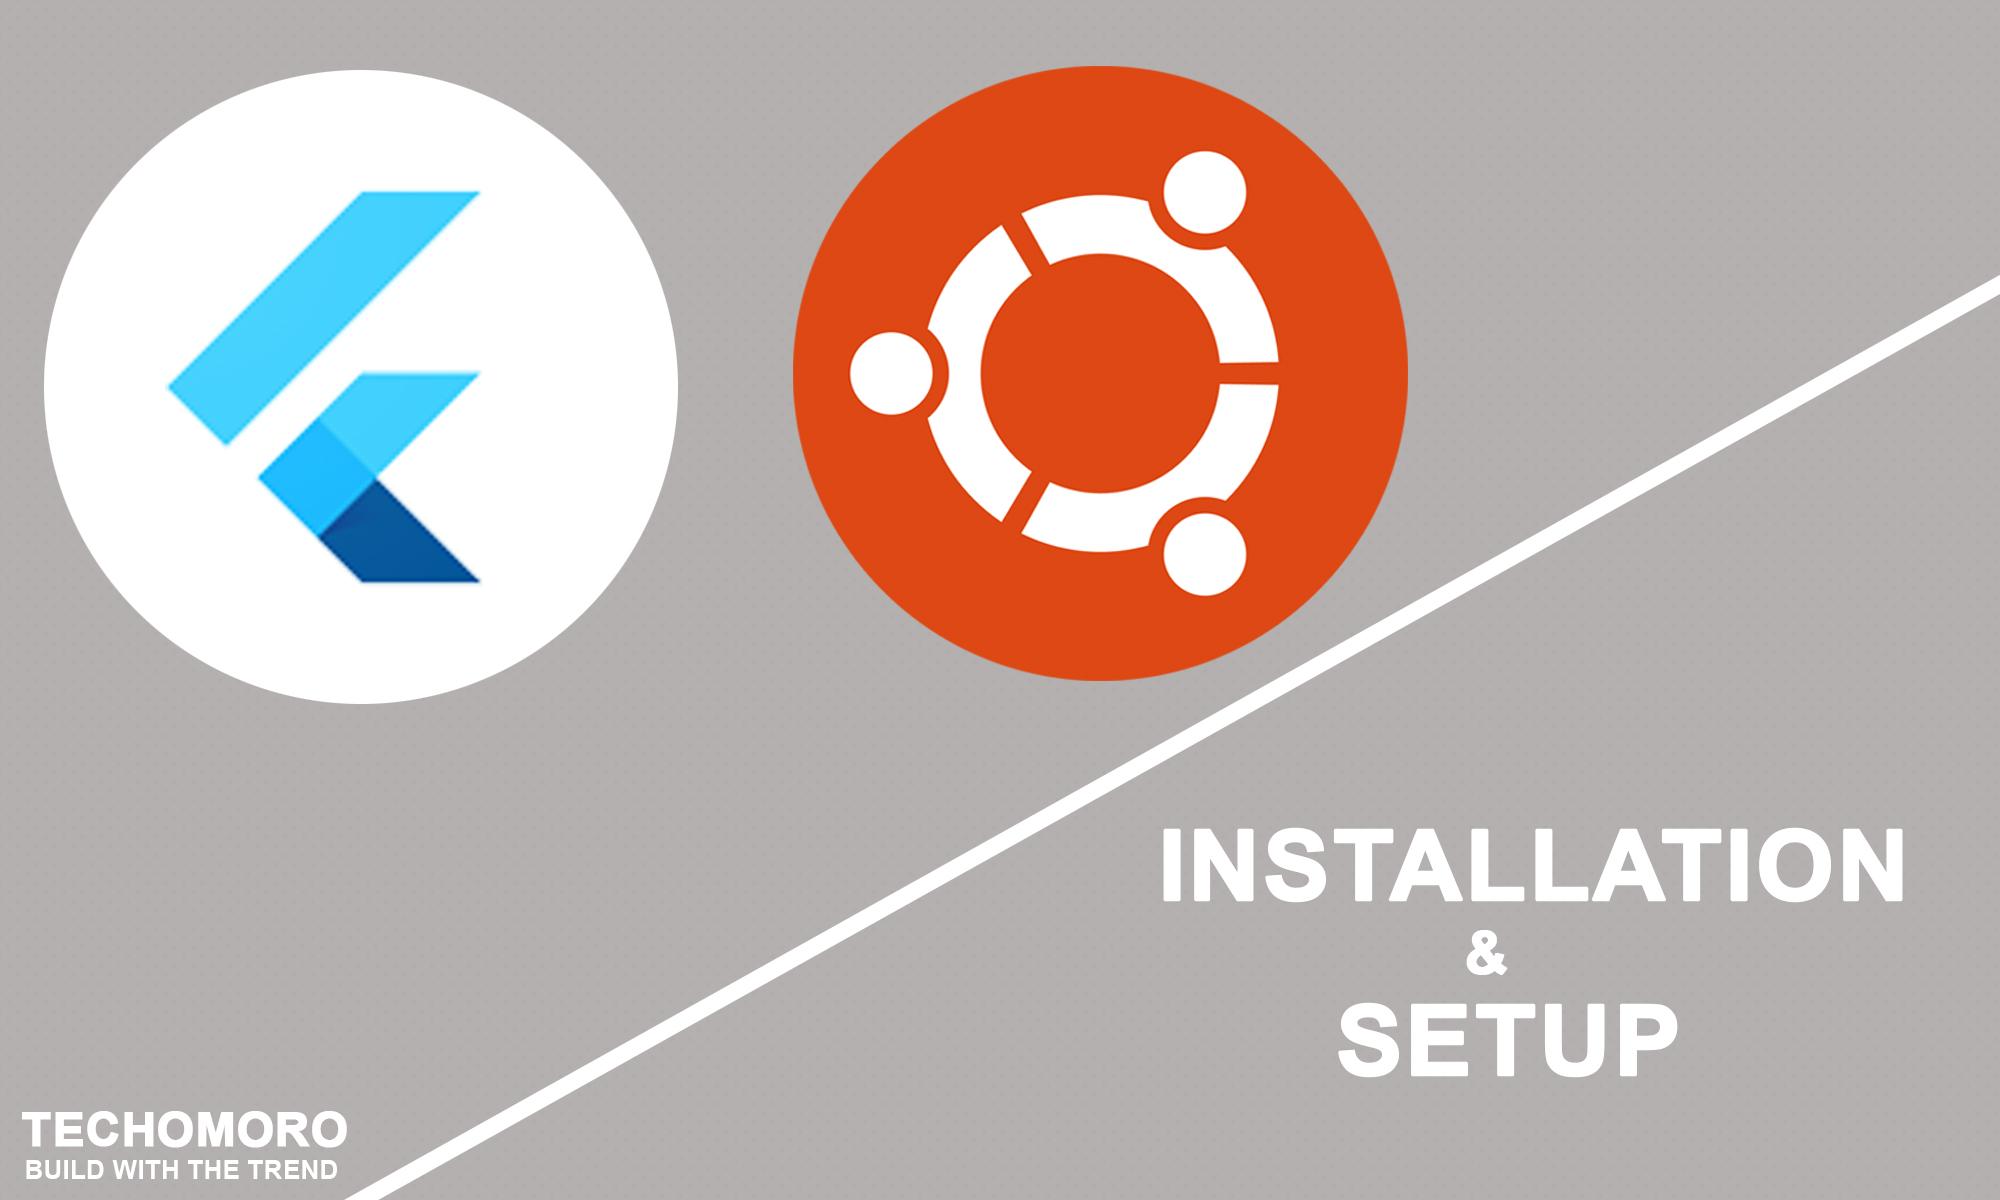 How to Install and Setup Flutter on Ubuntu 18.04.1 LTS (Bionic Beaver)